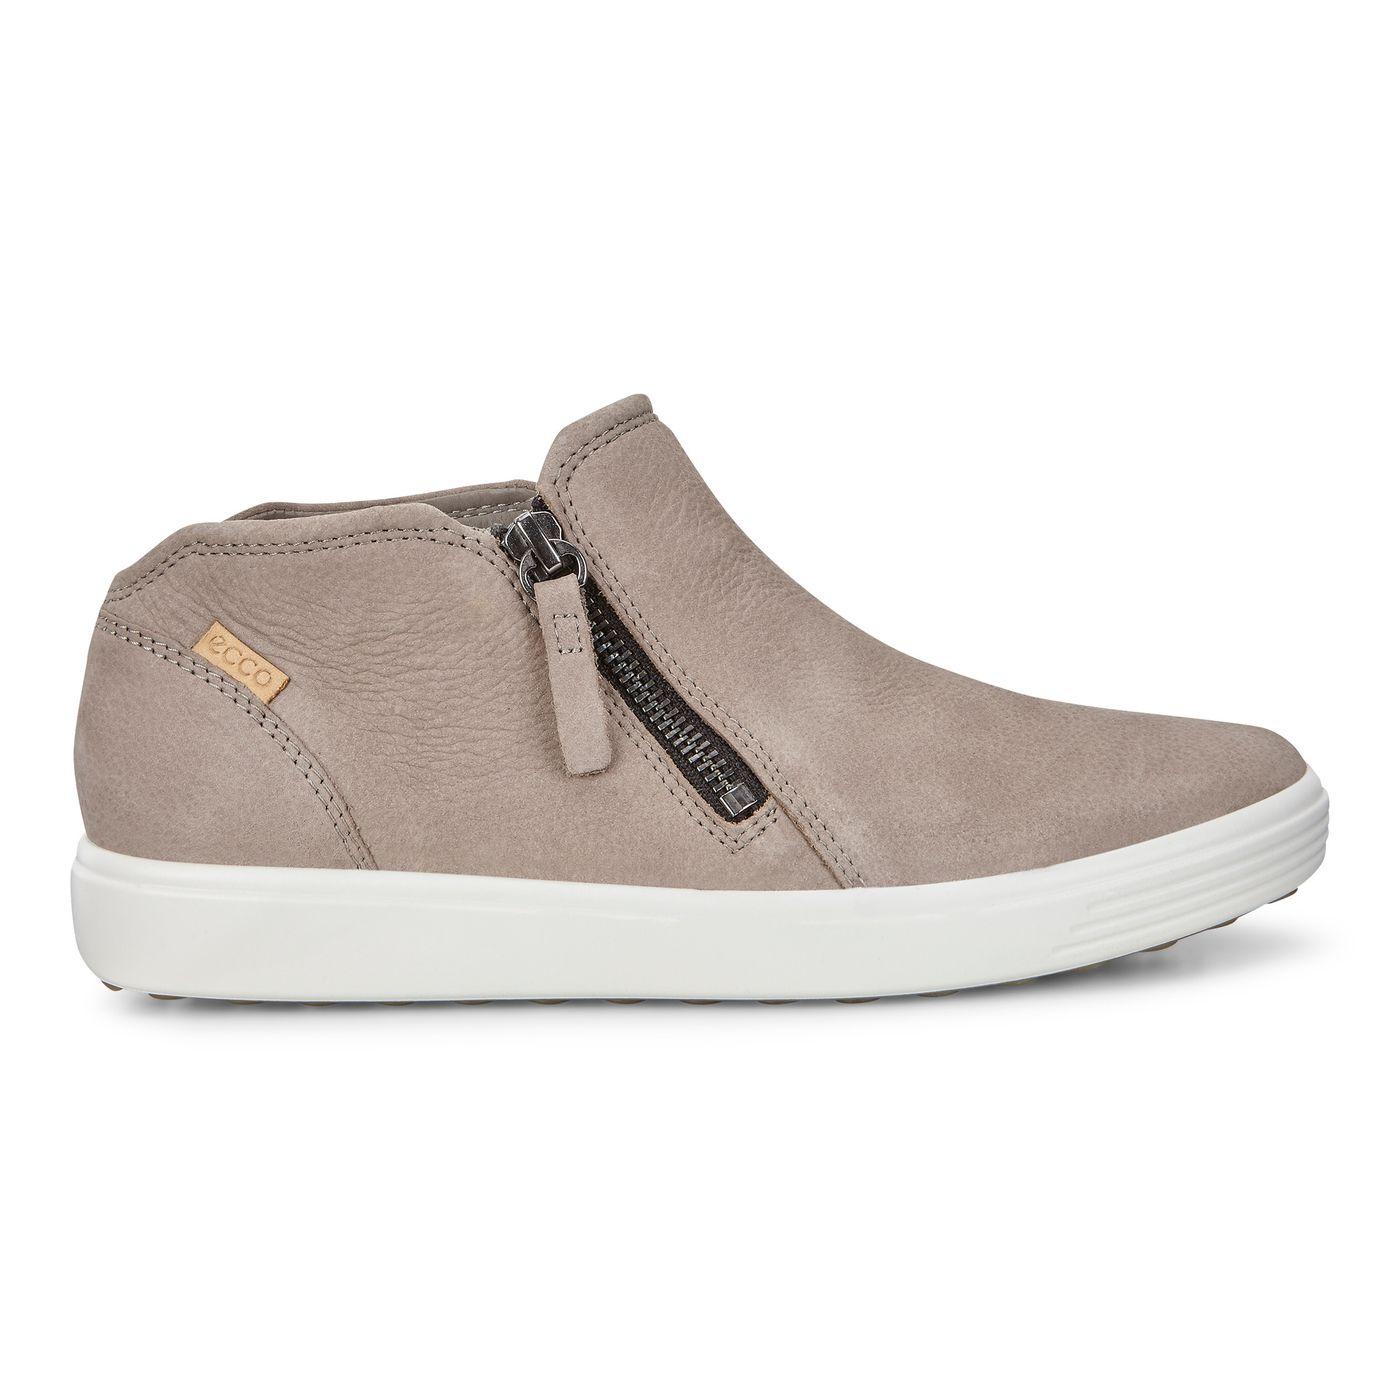 Ecco Women S Soft 7 Women S Casual Boots Ecco Shoes Womens Casual Boots Ecco Shoes Women Ecco Shoes